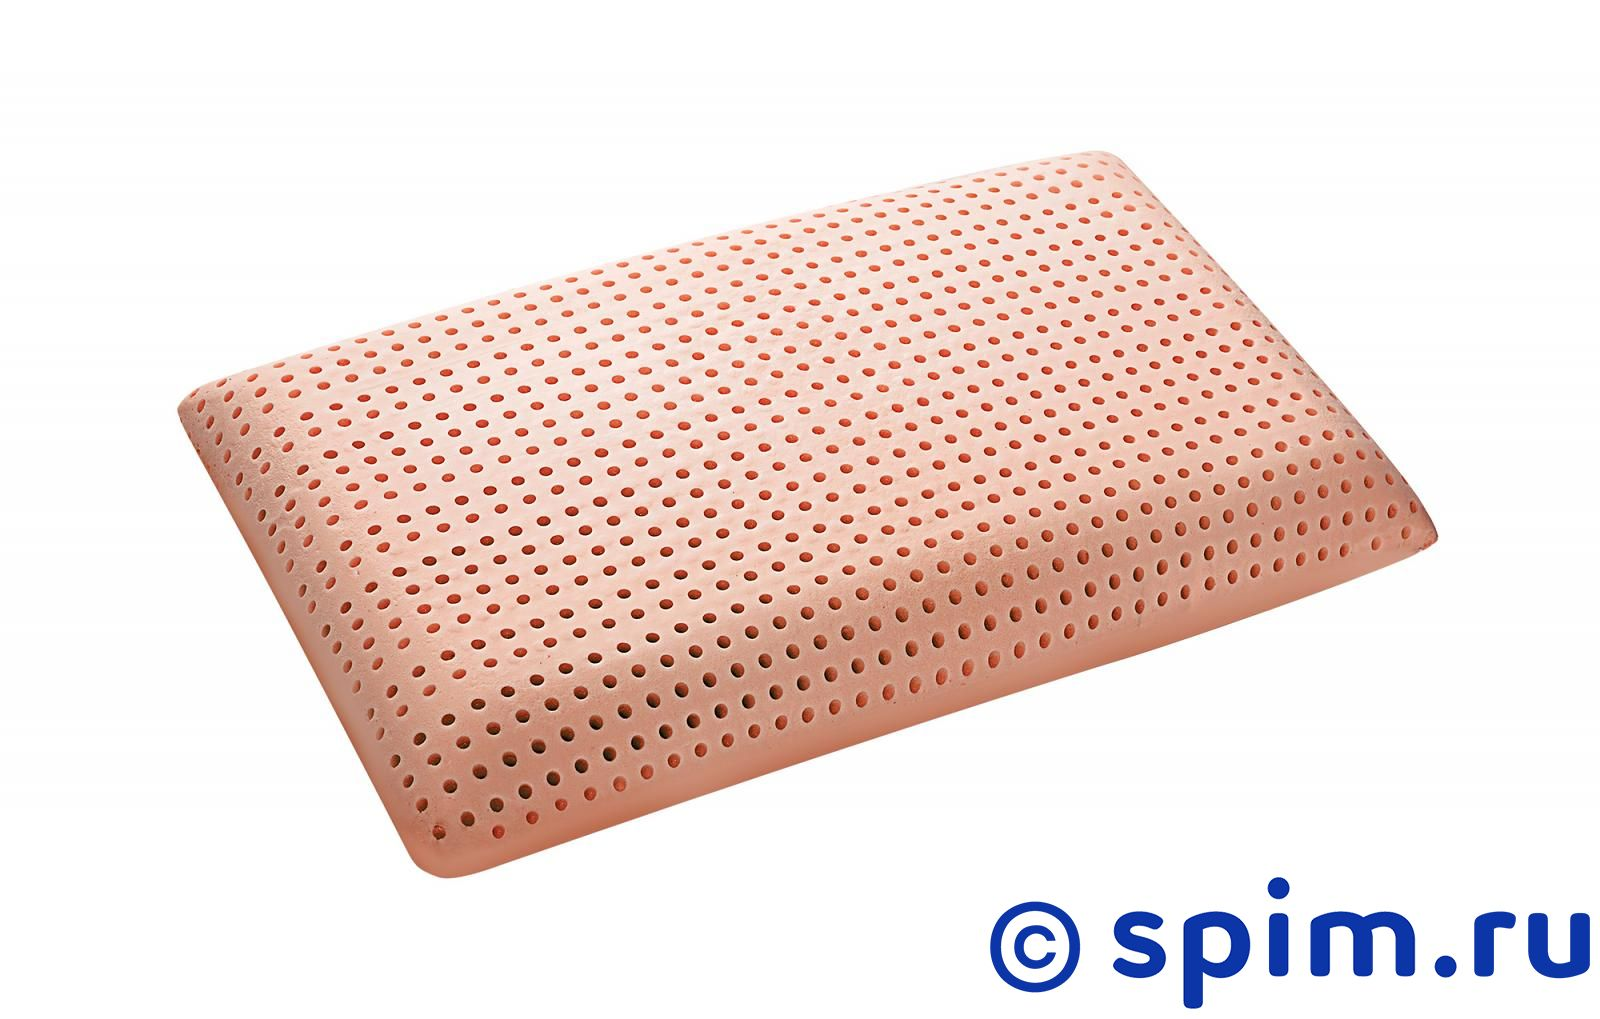 Подушка Saponetta Clean Memory позиционеры для сна candide подушка угловая memory 15° 60x120 см